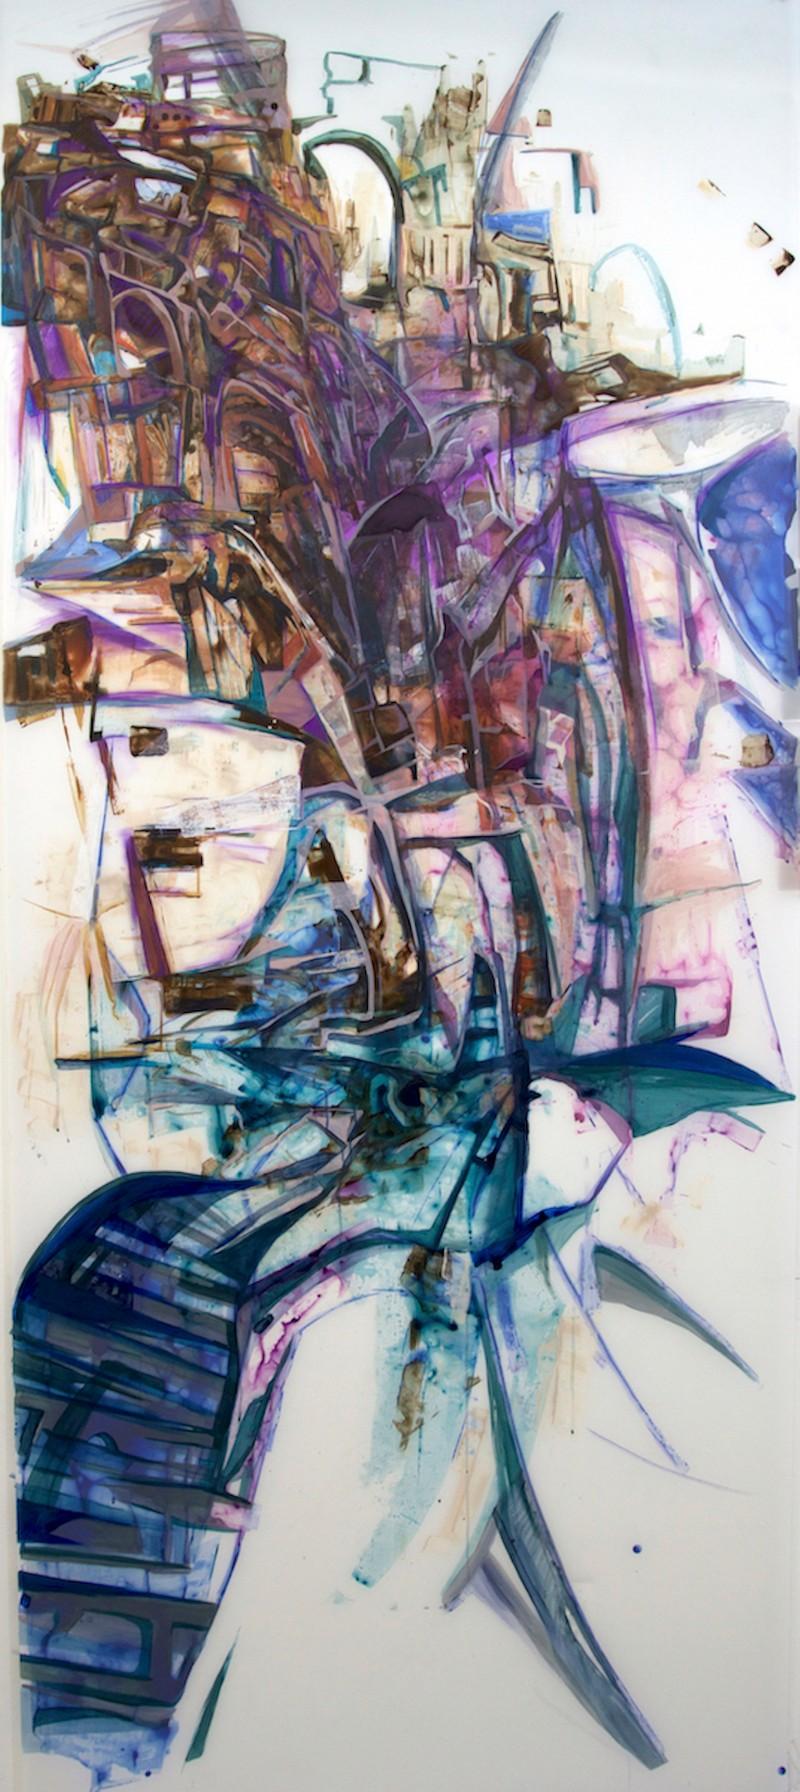 Artwork – Archway, 2017